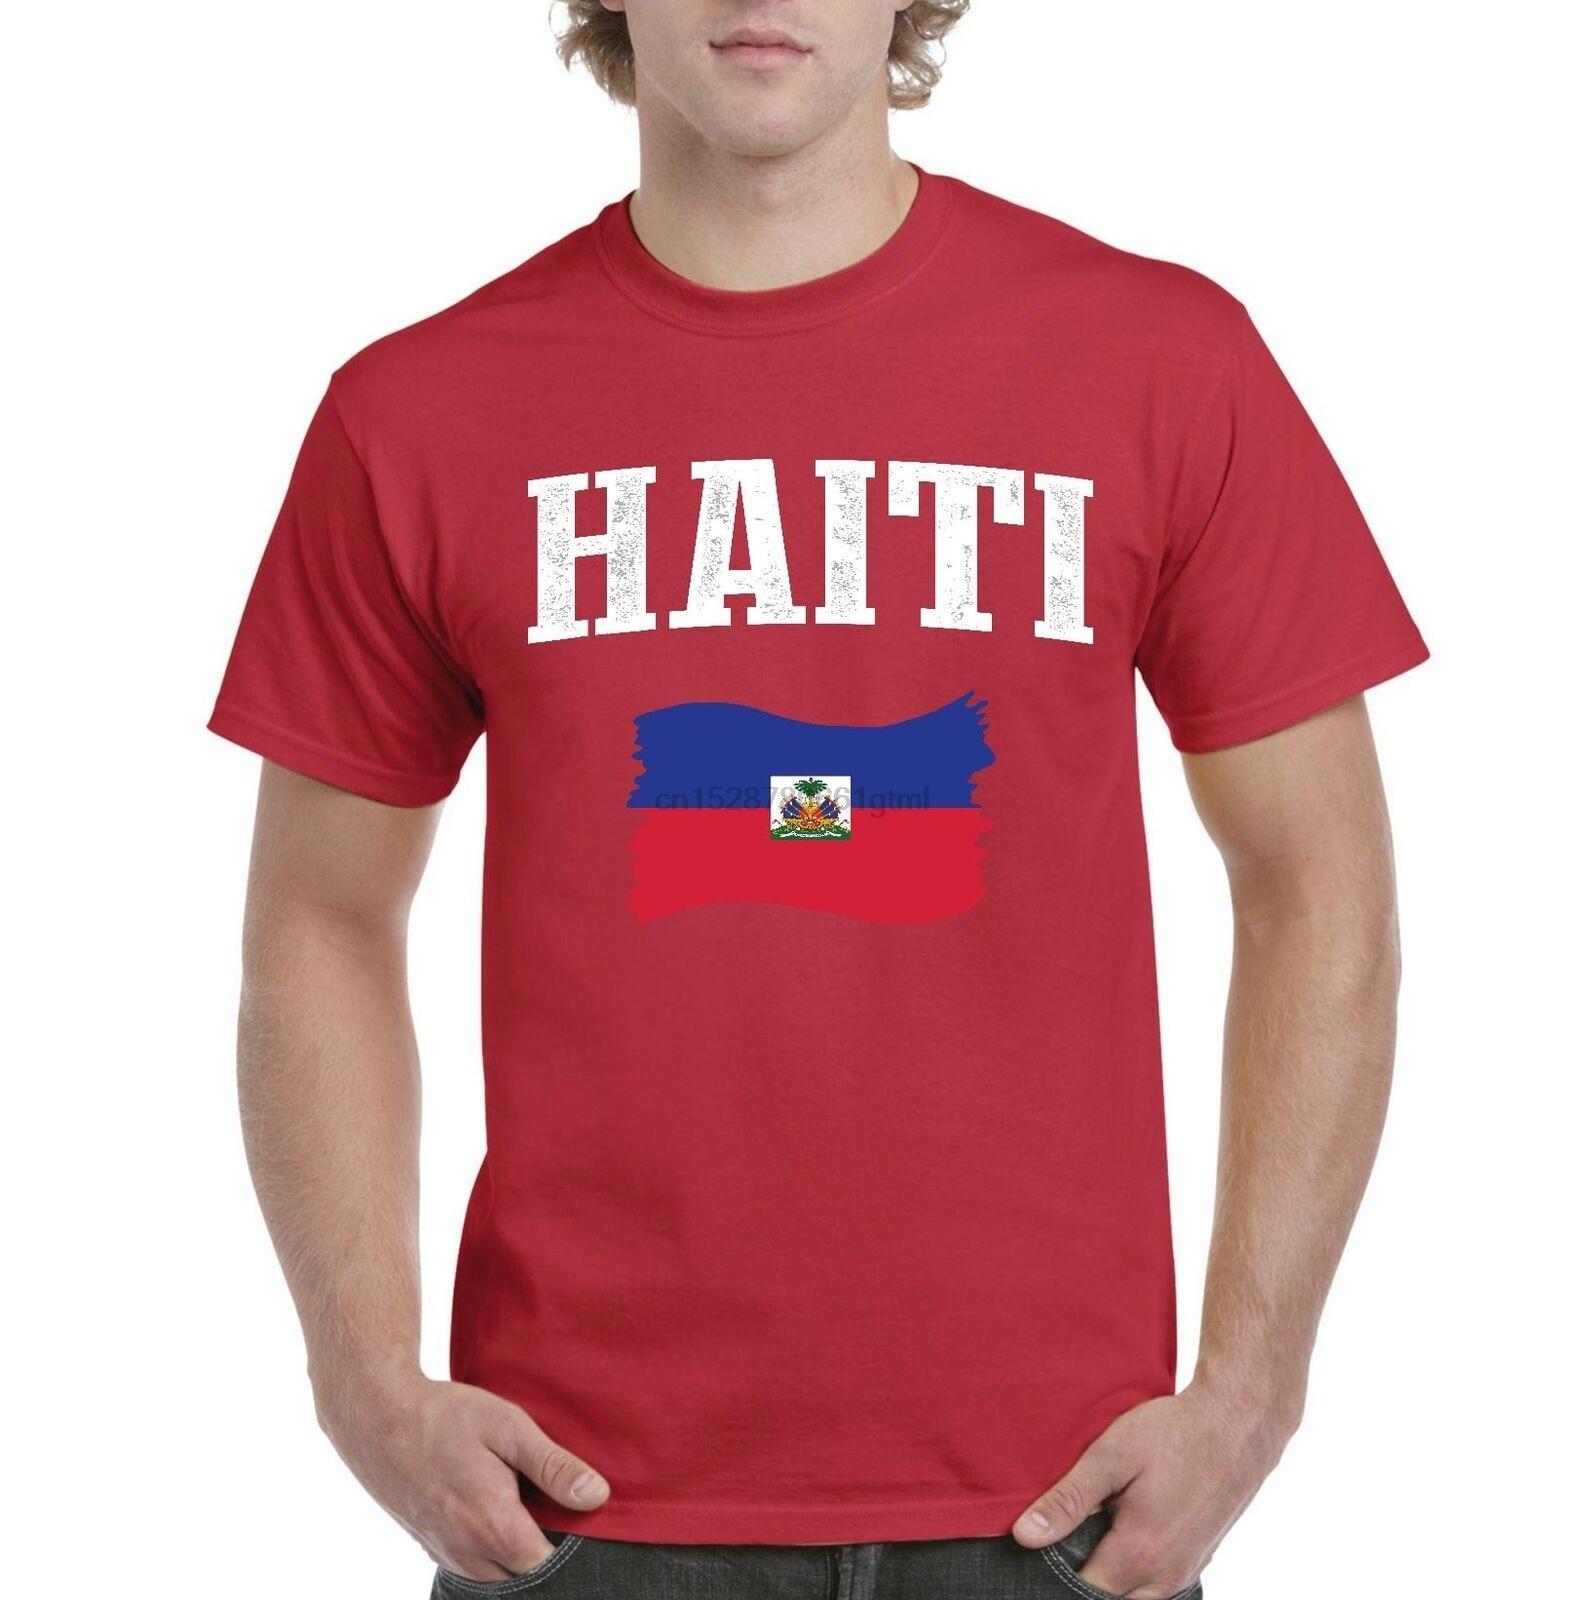 Camiseta para hombre de Haití